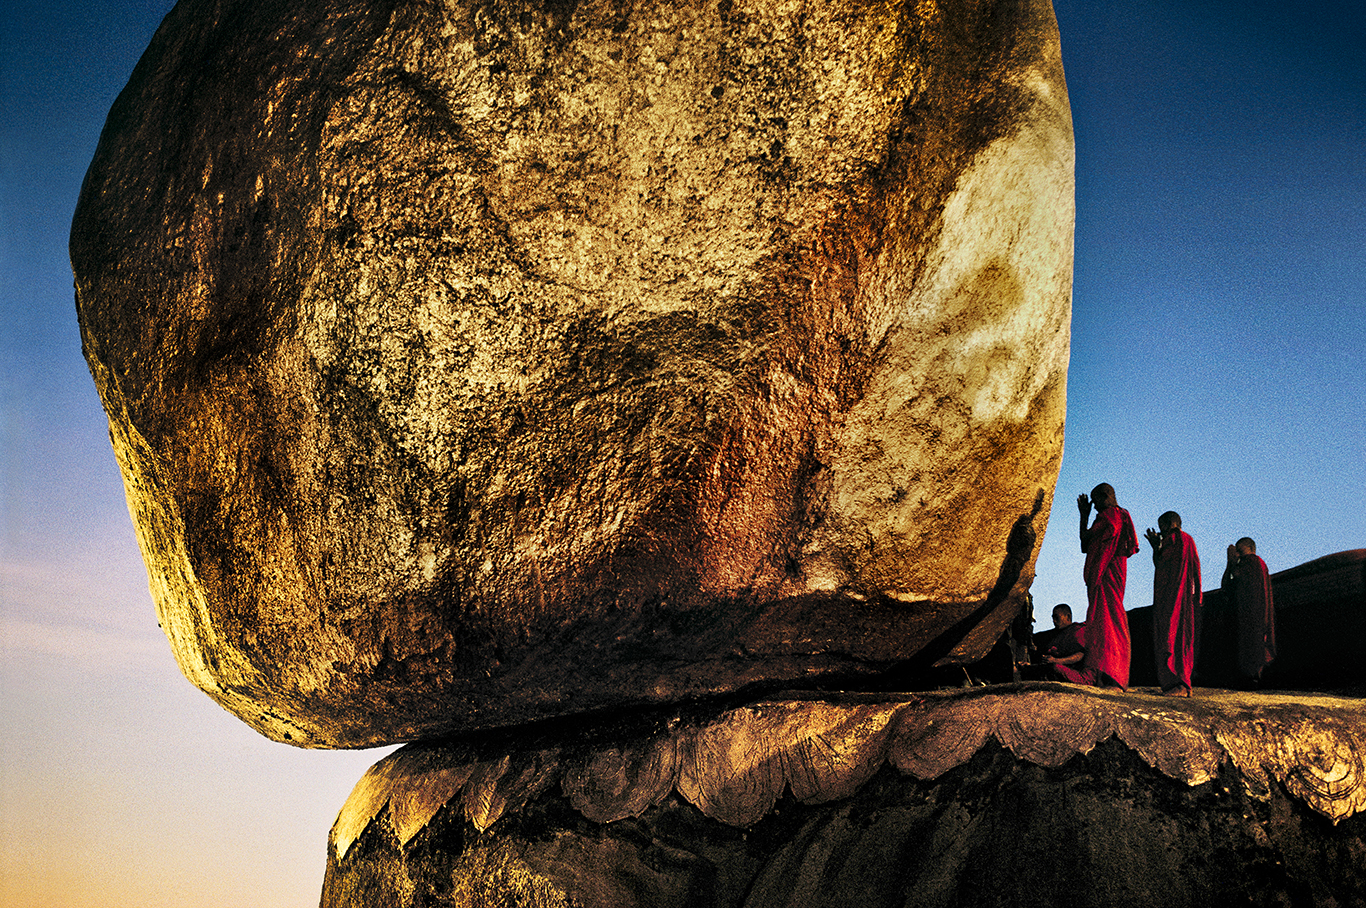 Стив МакКарри. Монахи на Золотой скале. Кьяикто, Мьянма, 1994